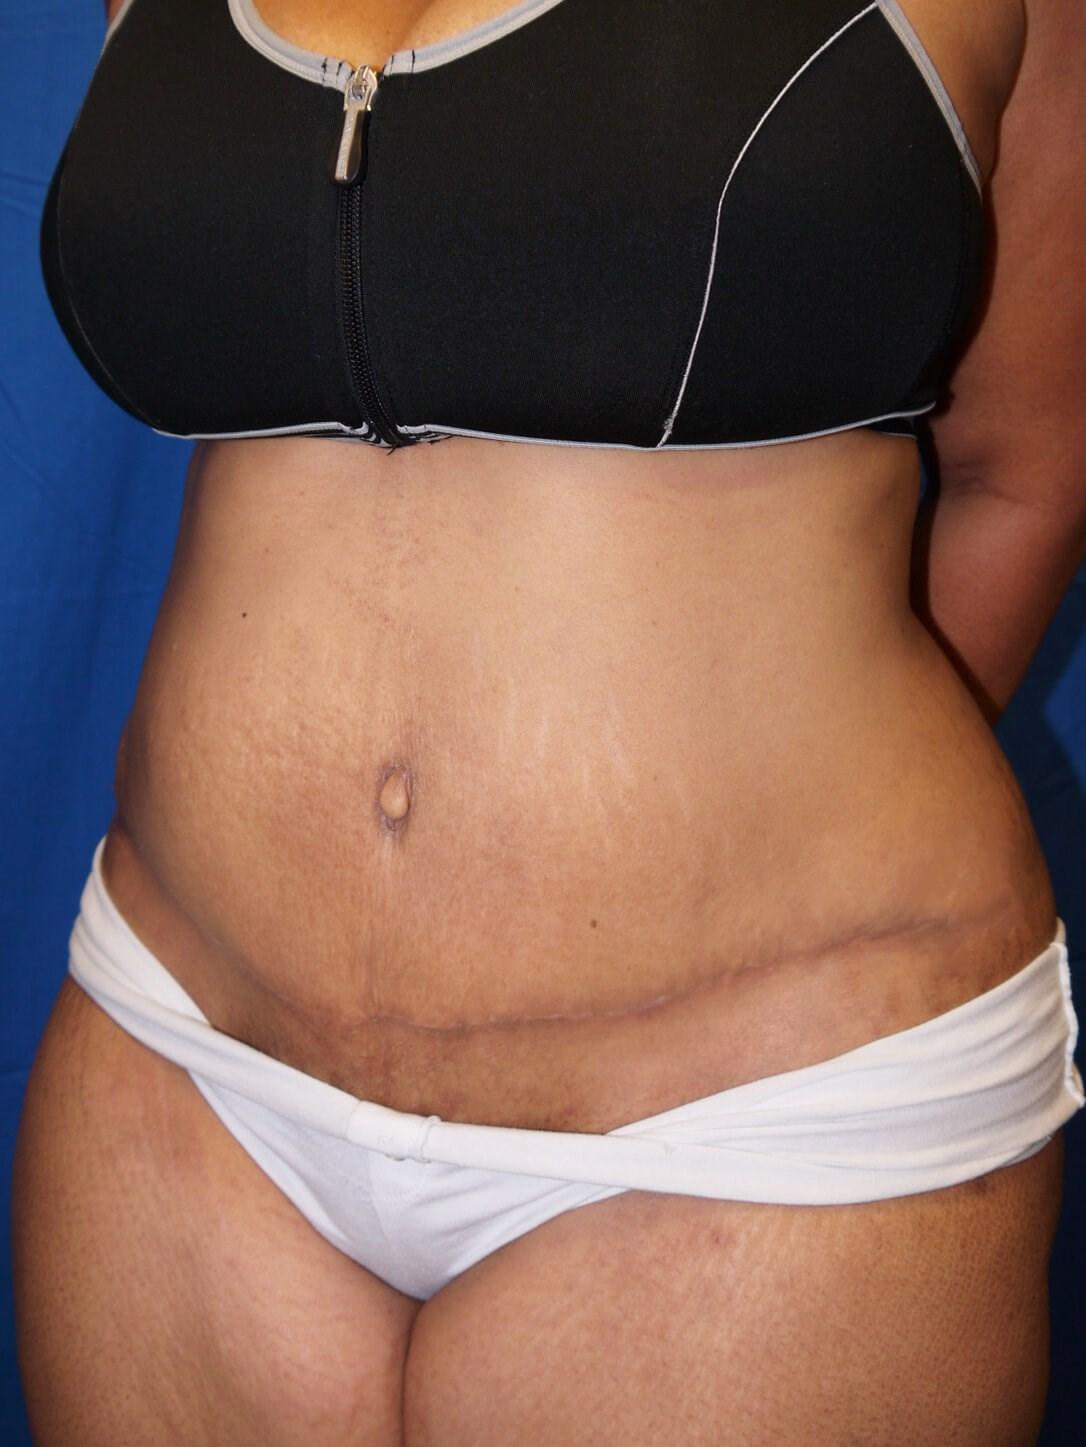 After weight loss surgery Left Oblique View - Left Oblique View